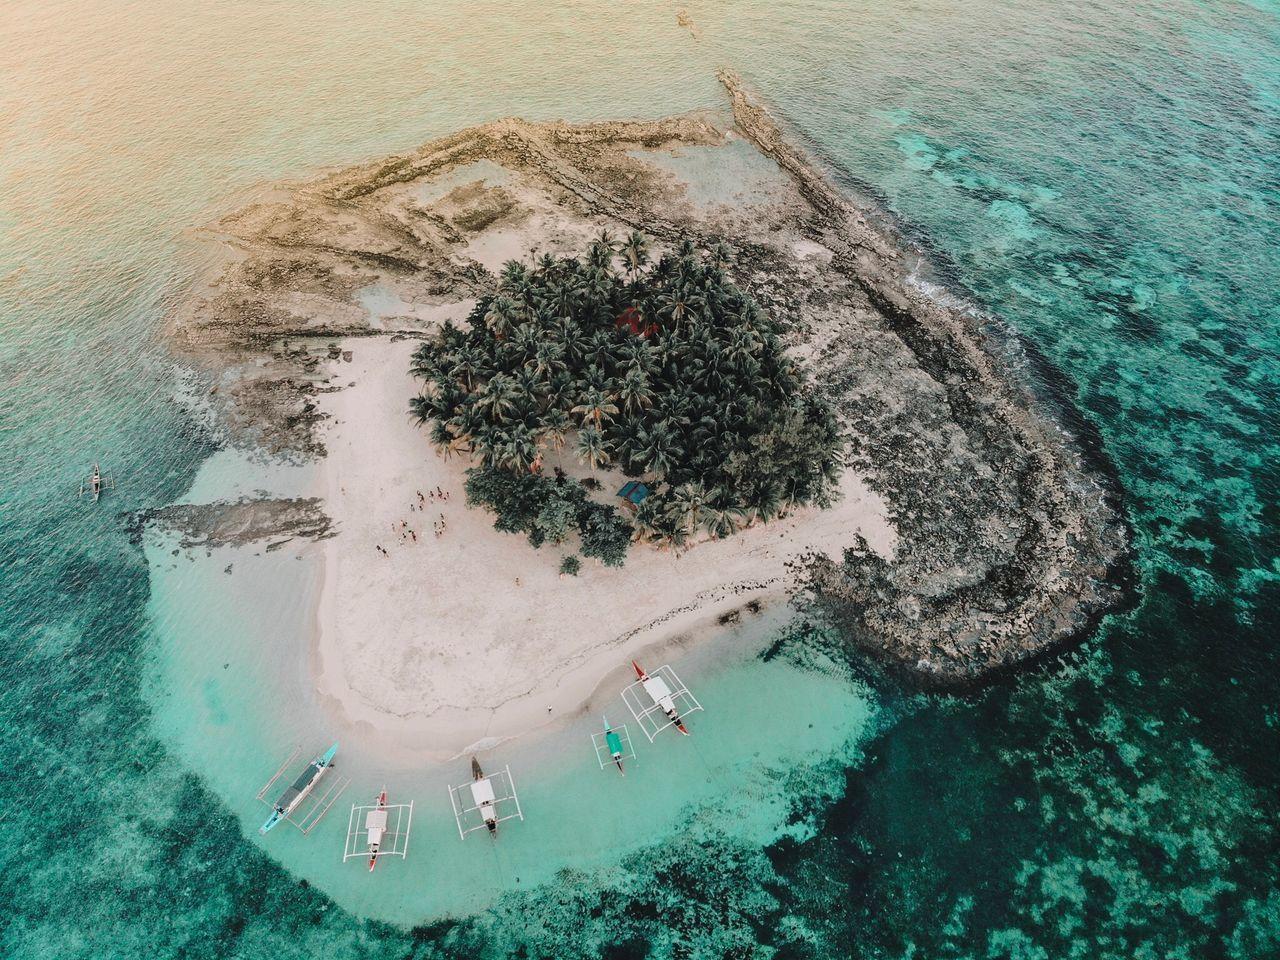 HIGH ANGLE VIEW OF BEACH UMBRELLAS